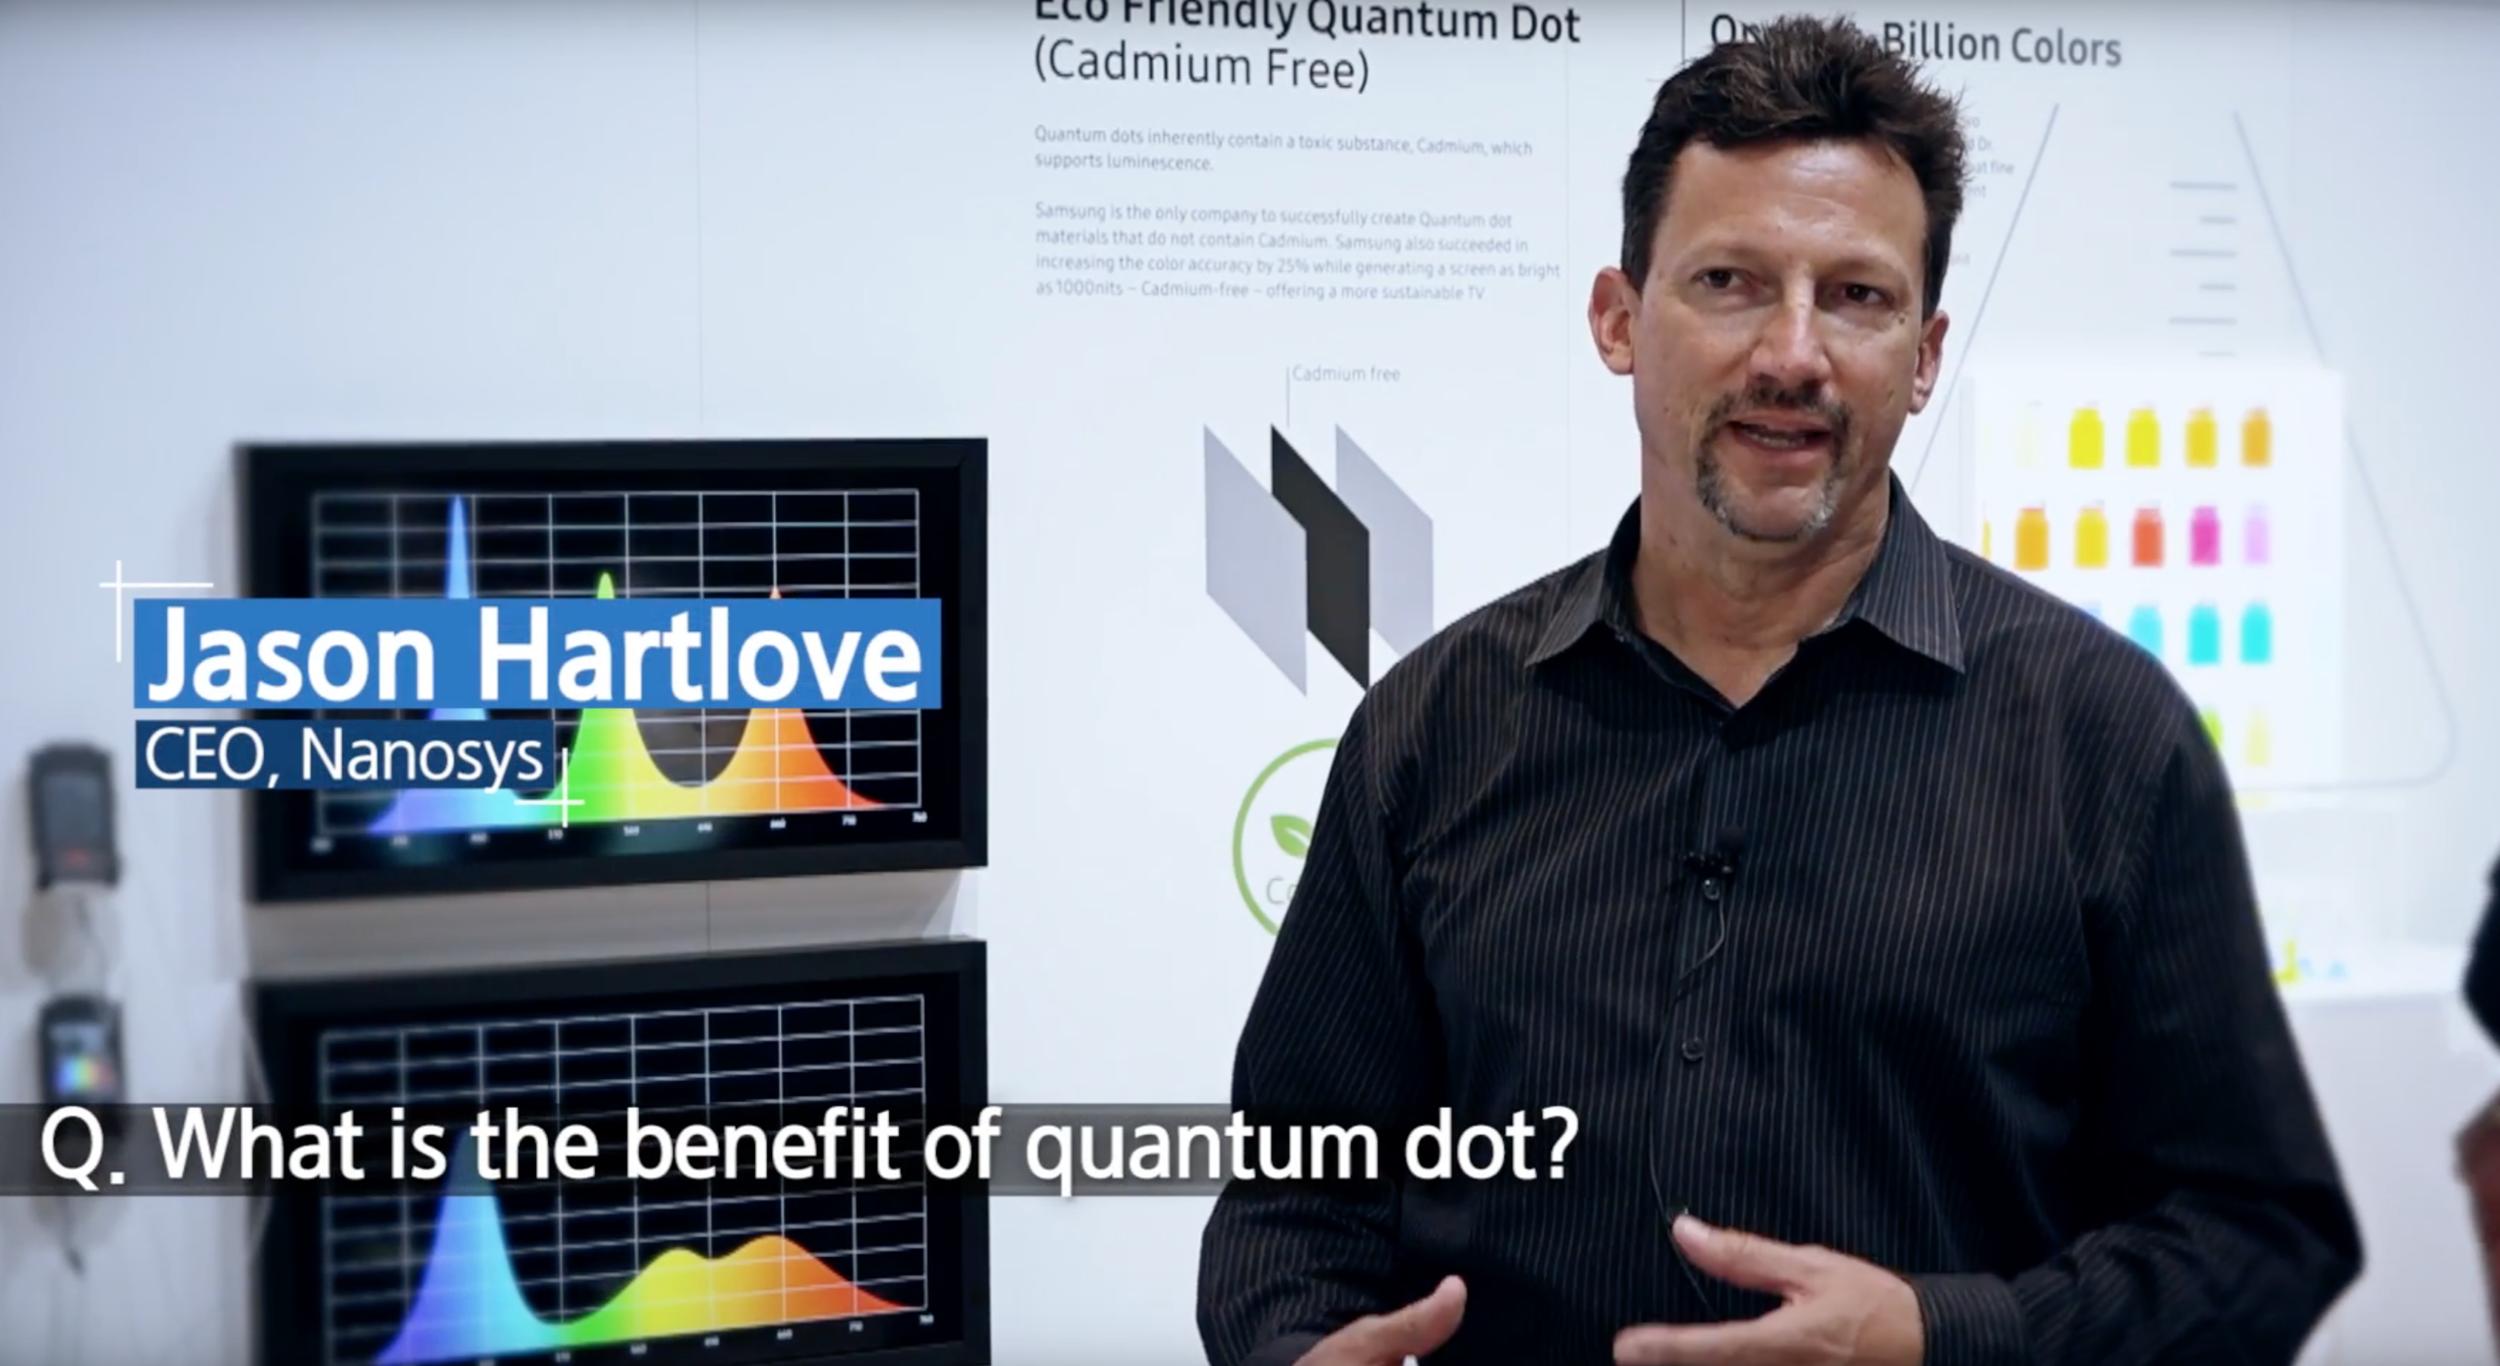 Nanosys CEO, Jason Hartlove (Image Credit: Samsung)